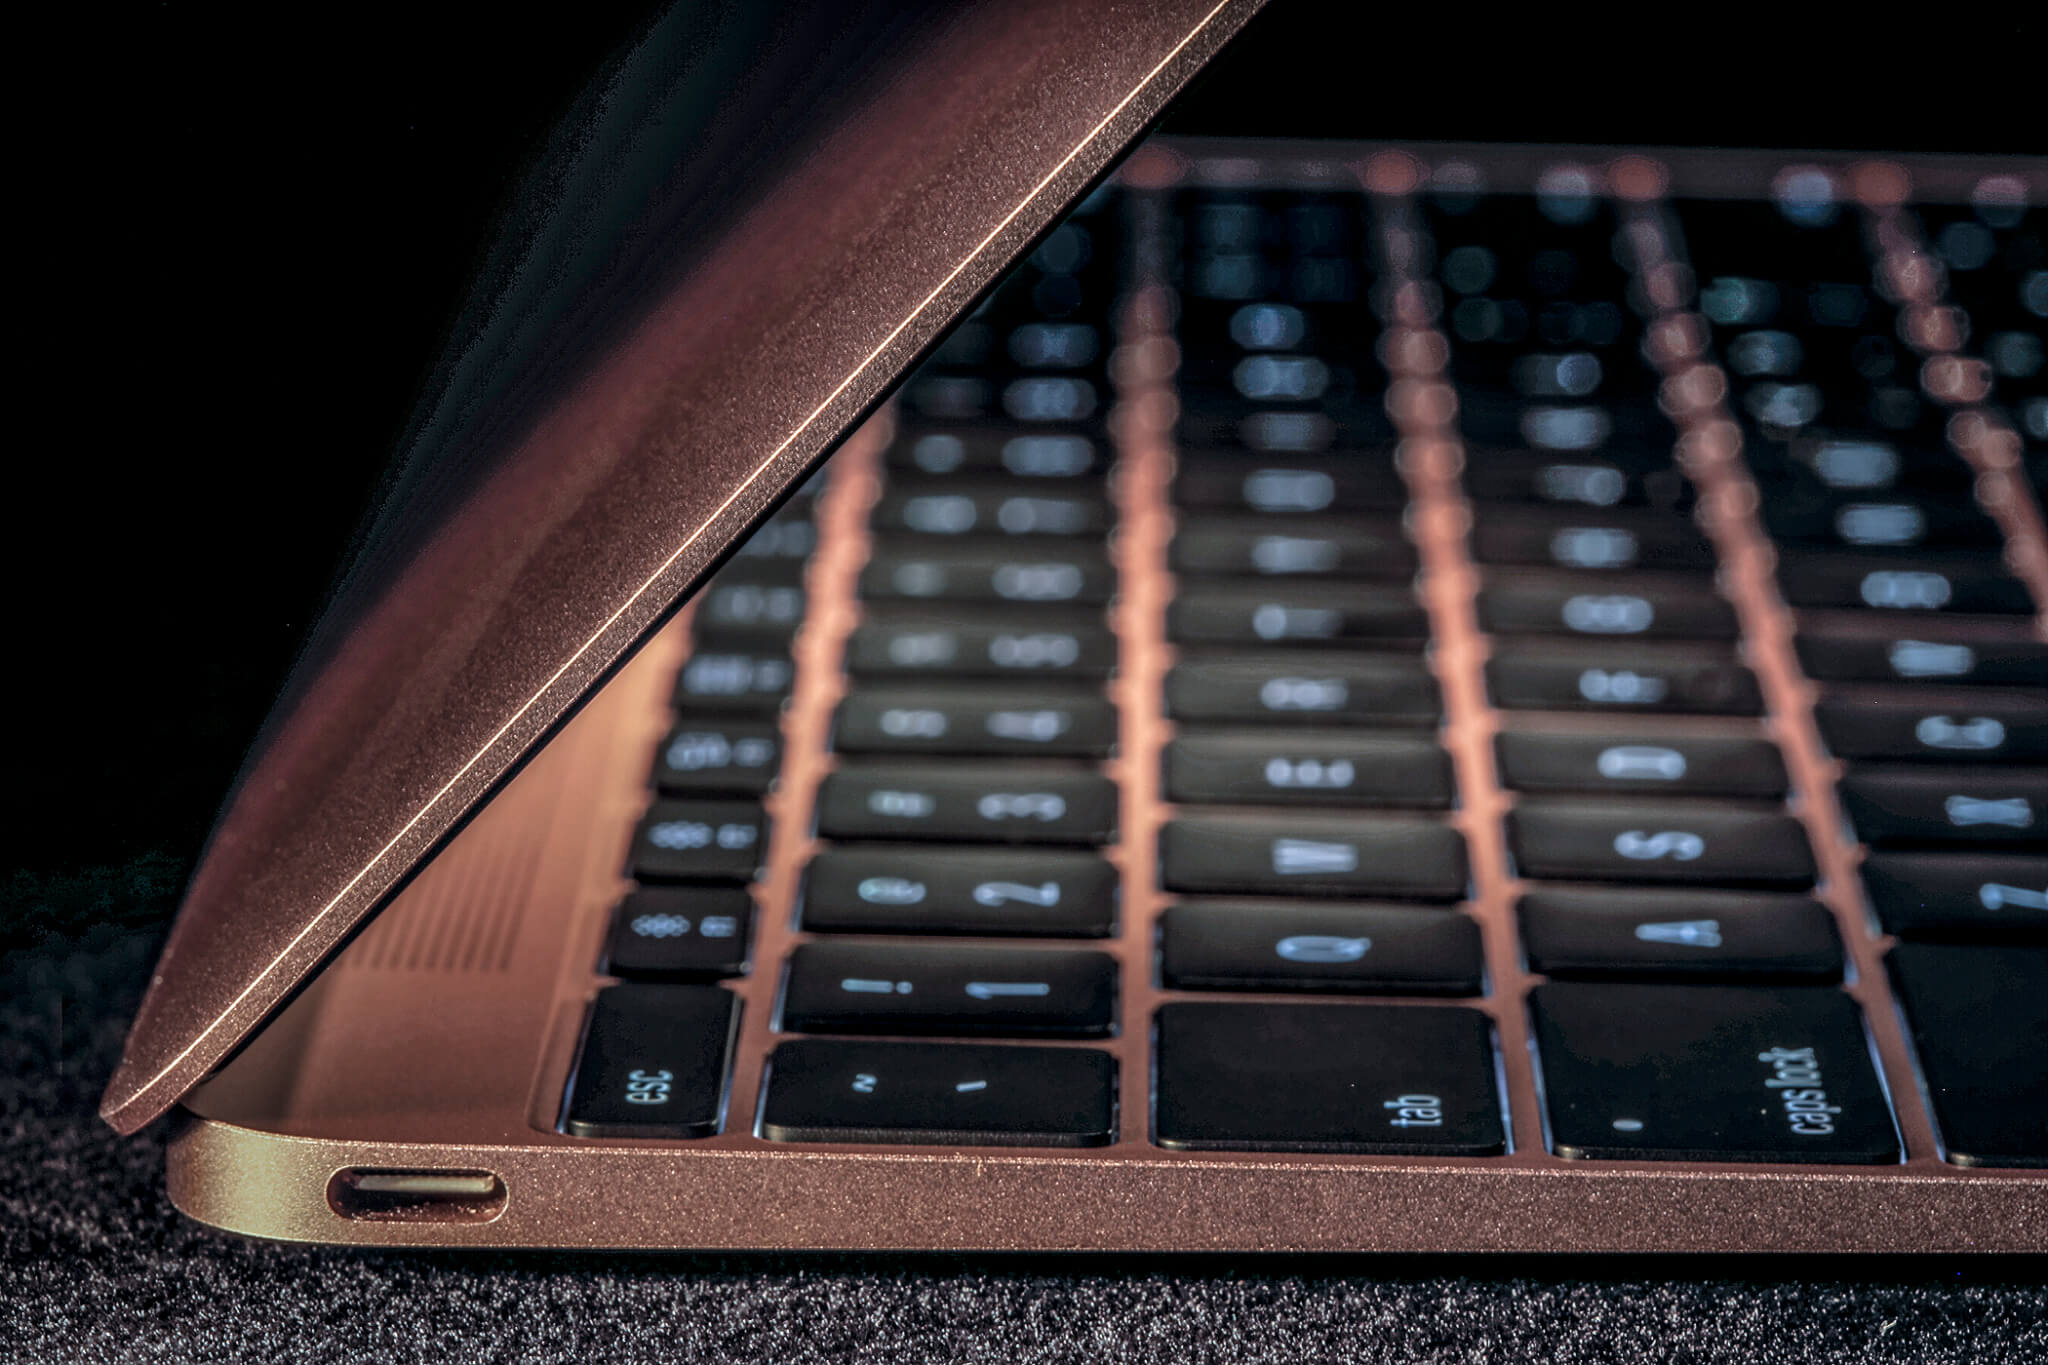 The MacBook's lone USB-C port.